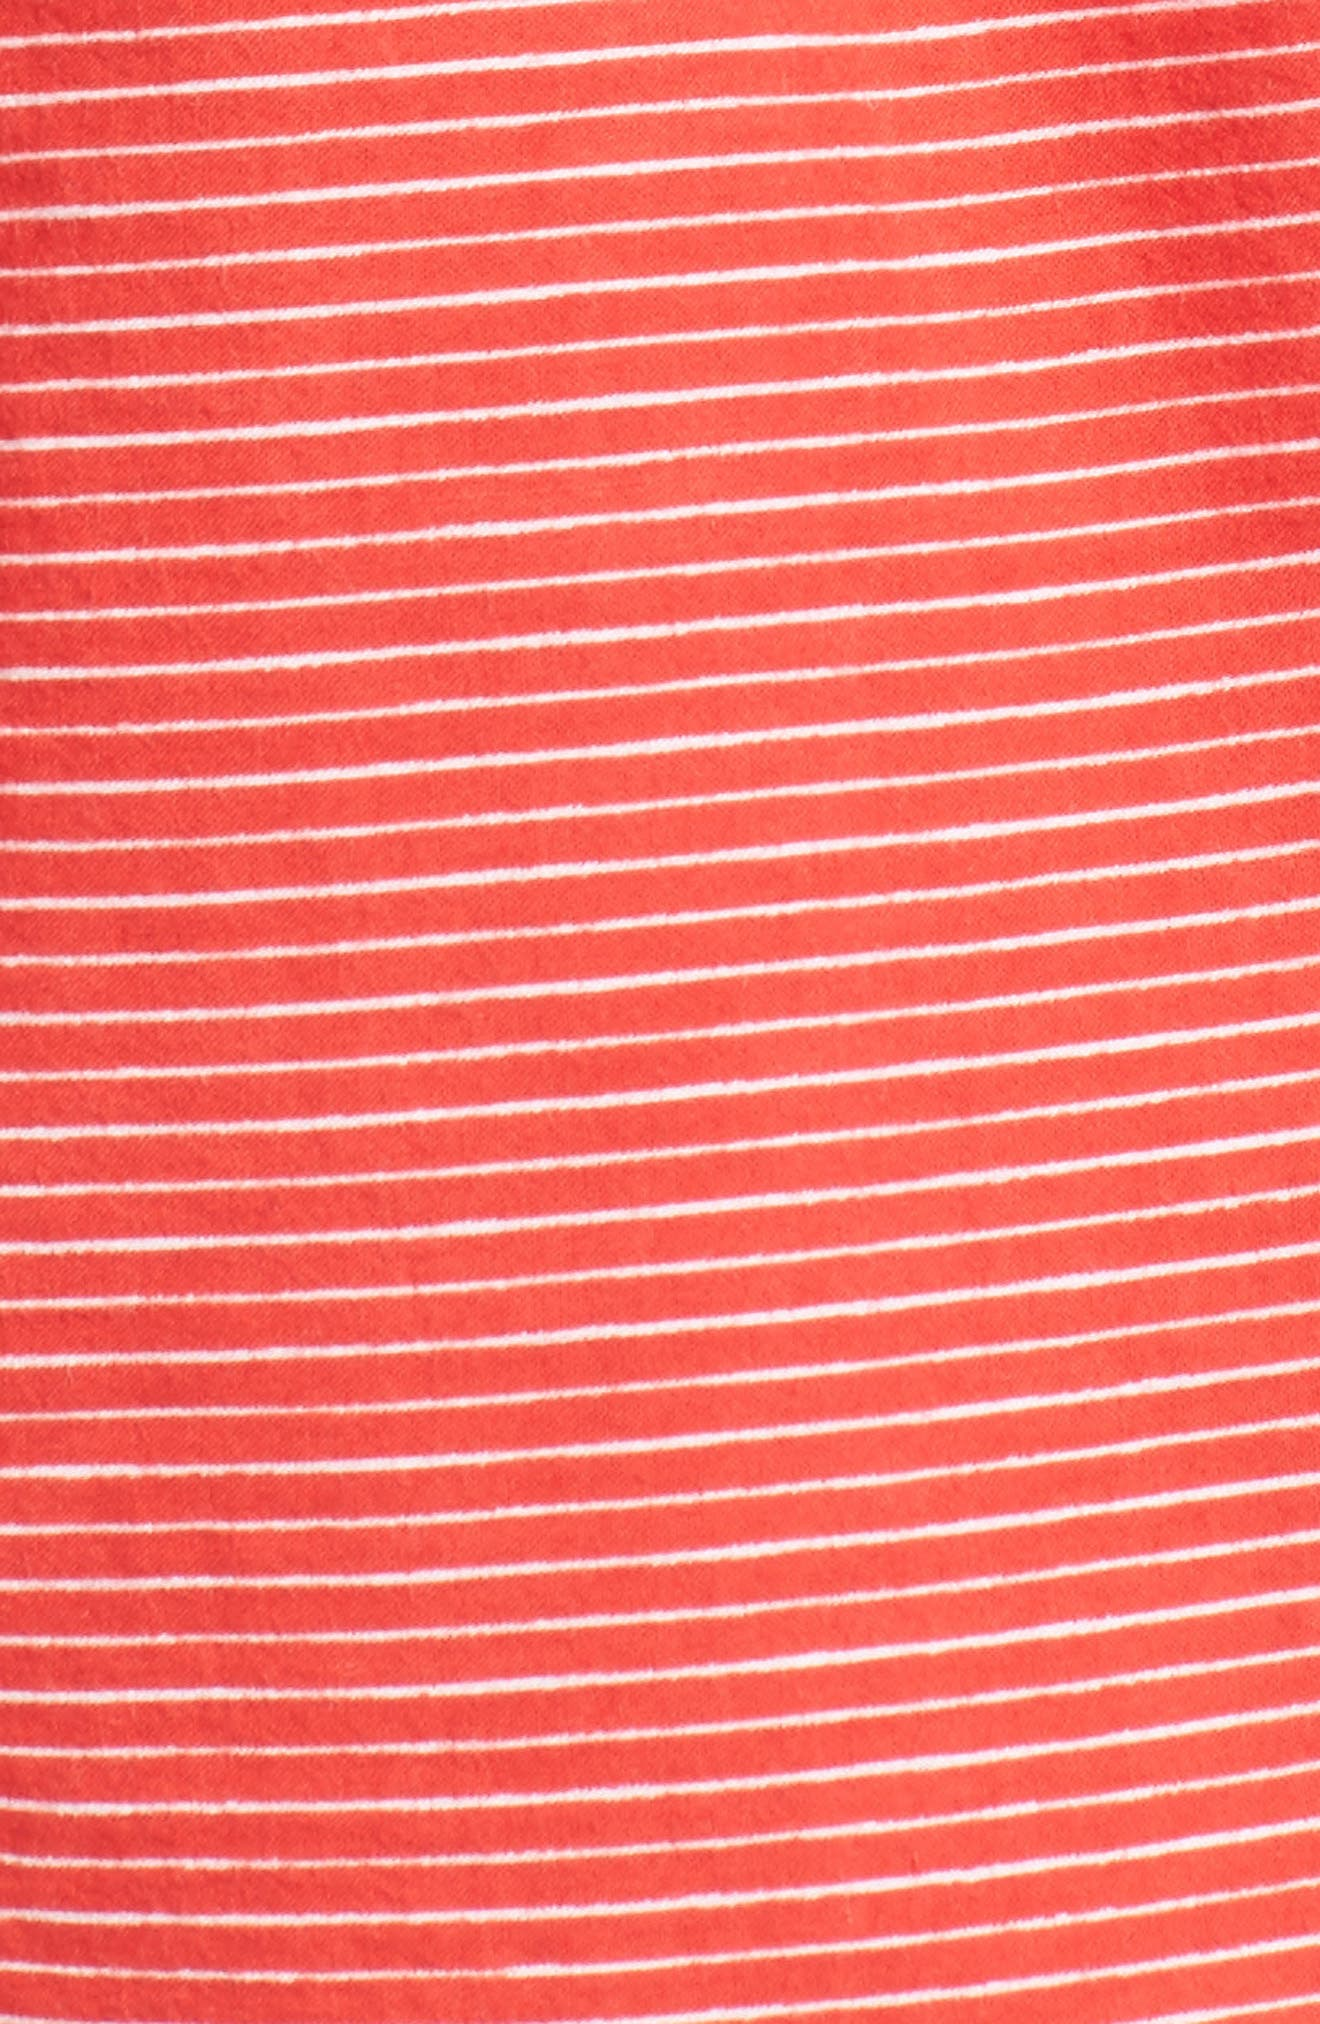 Avalon Cotton Shirtdress,                             Alternate thumbnail 6, color,                             Deep Sea Print Red